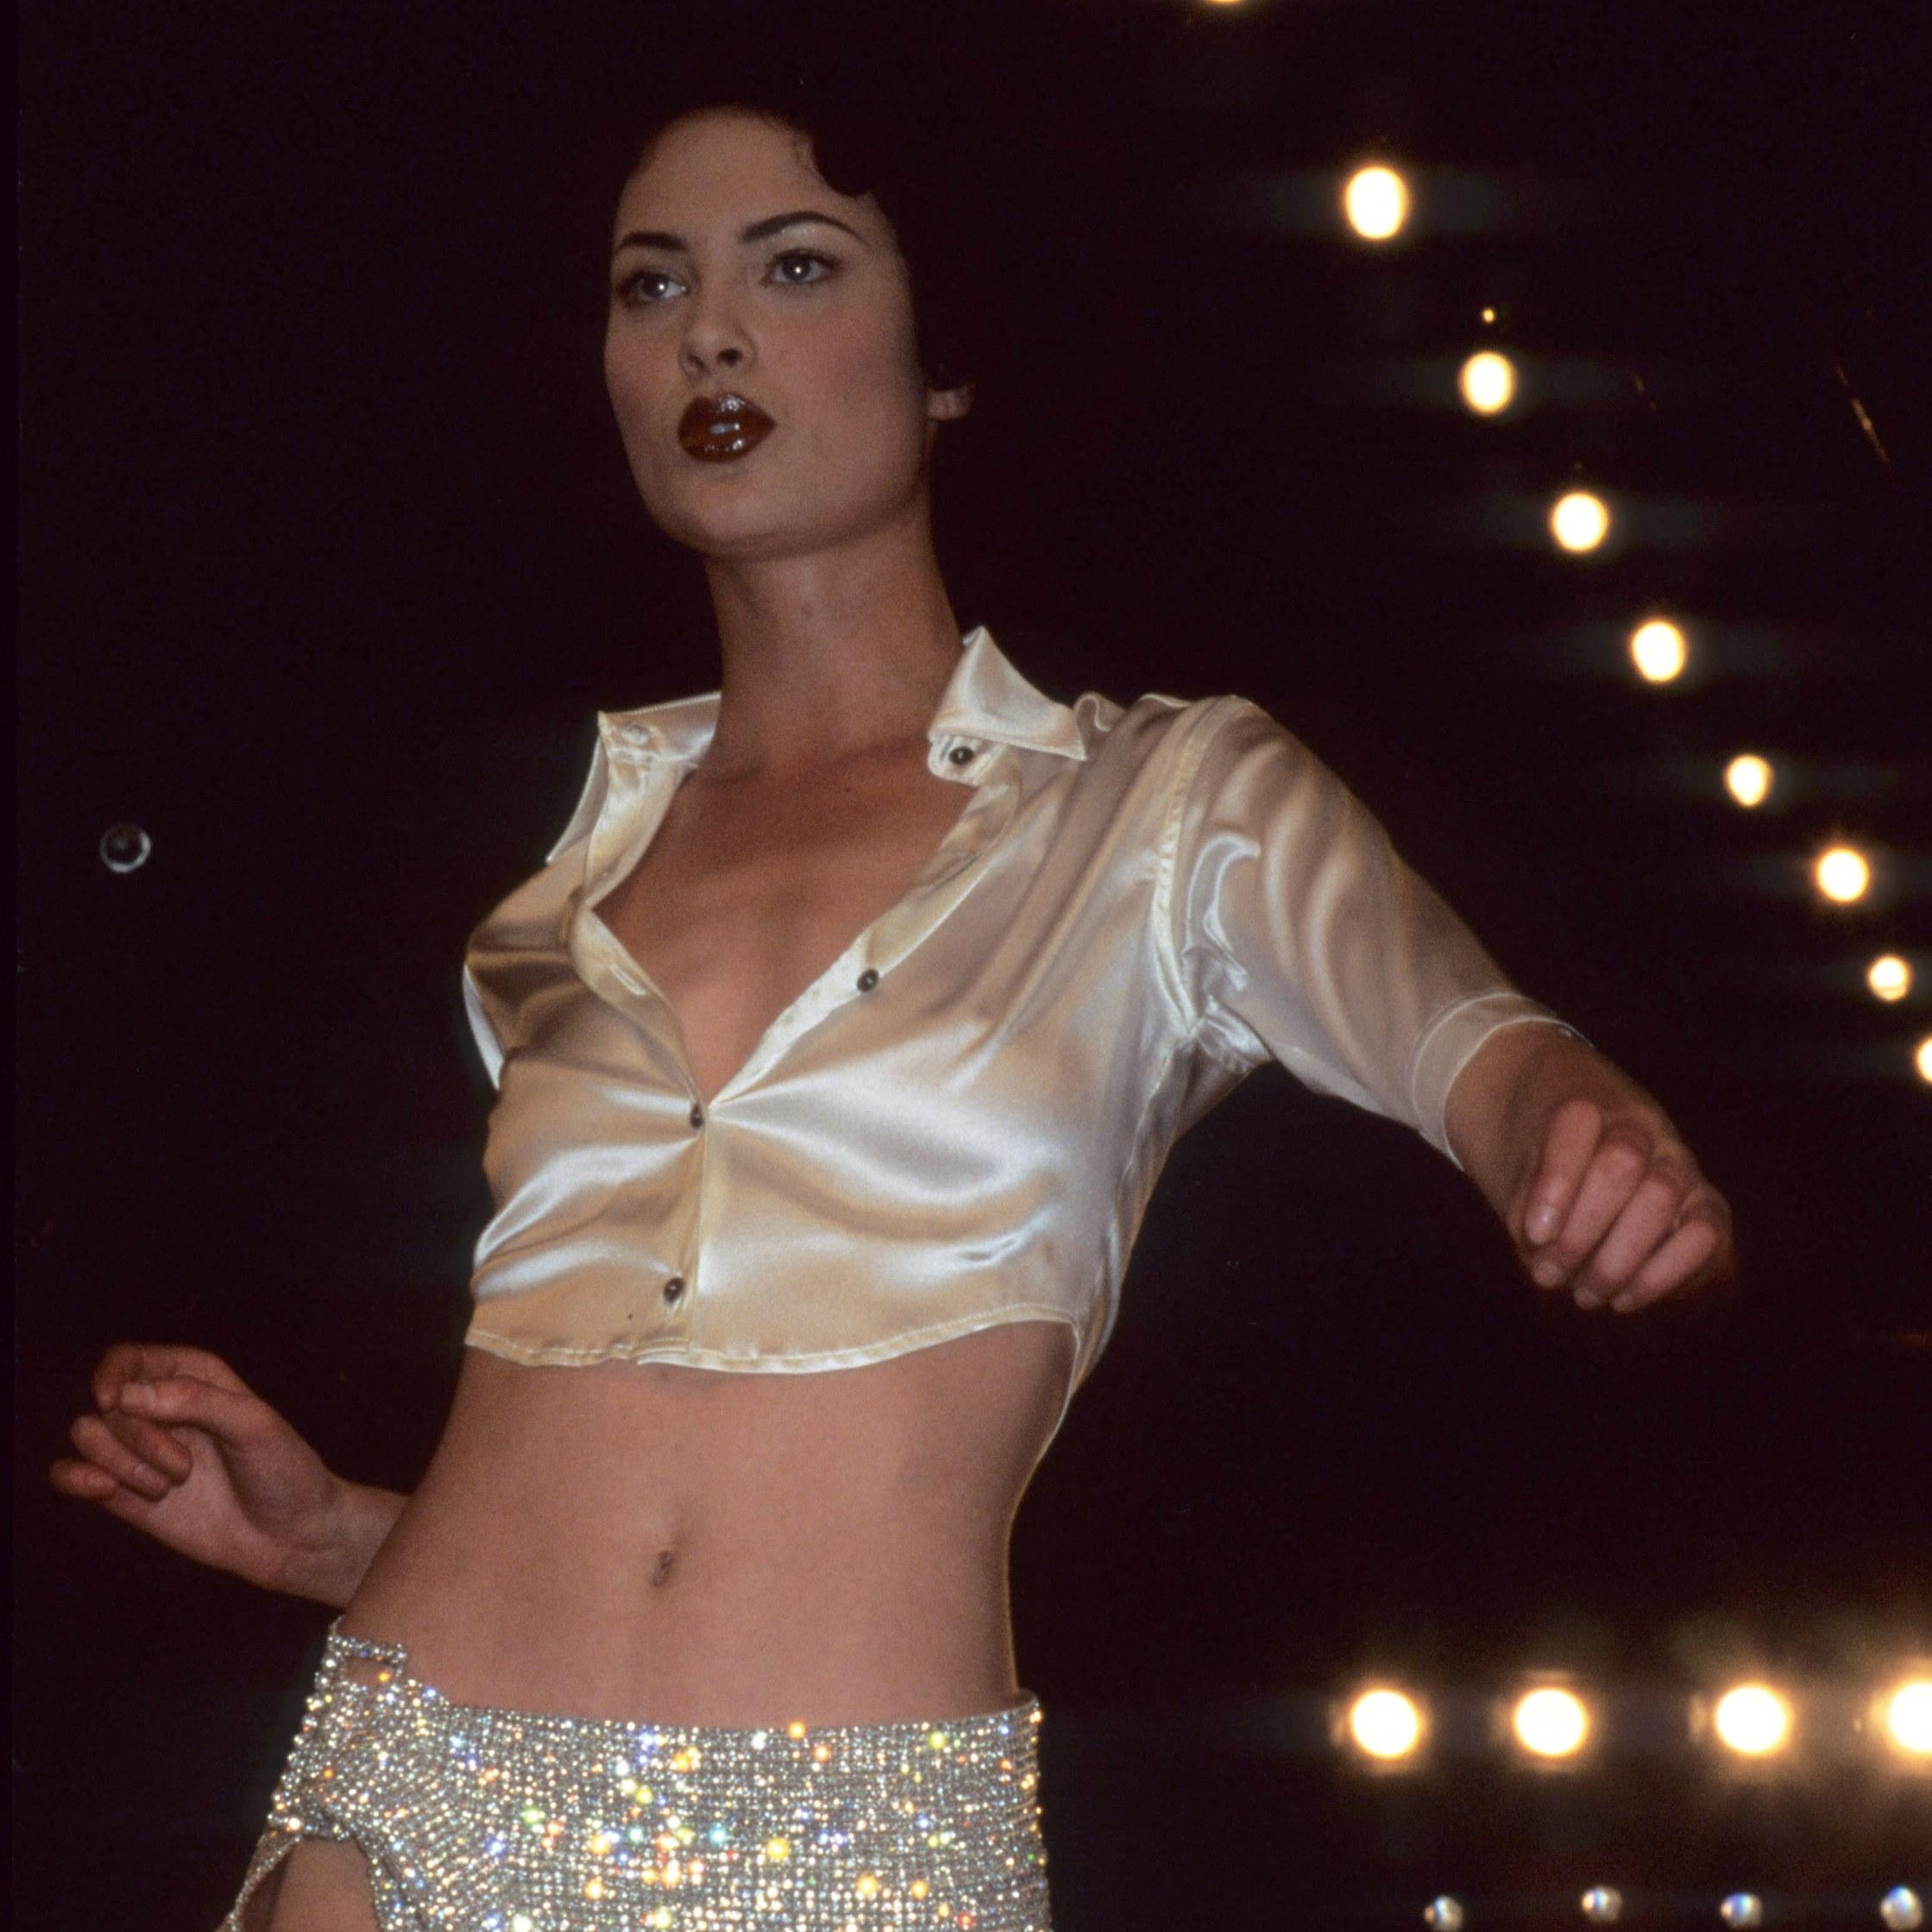 Leaked Soleil Moon Frye nudes (11 photo), Ass, Hot, Boobs, bra 2006